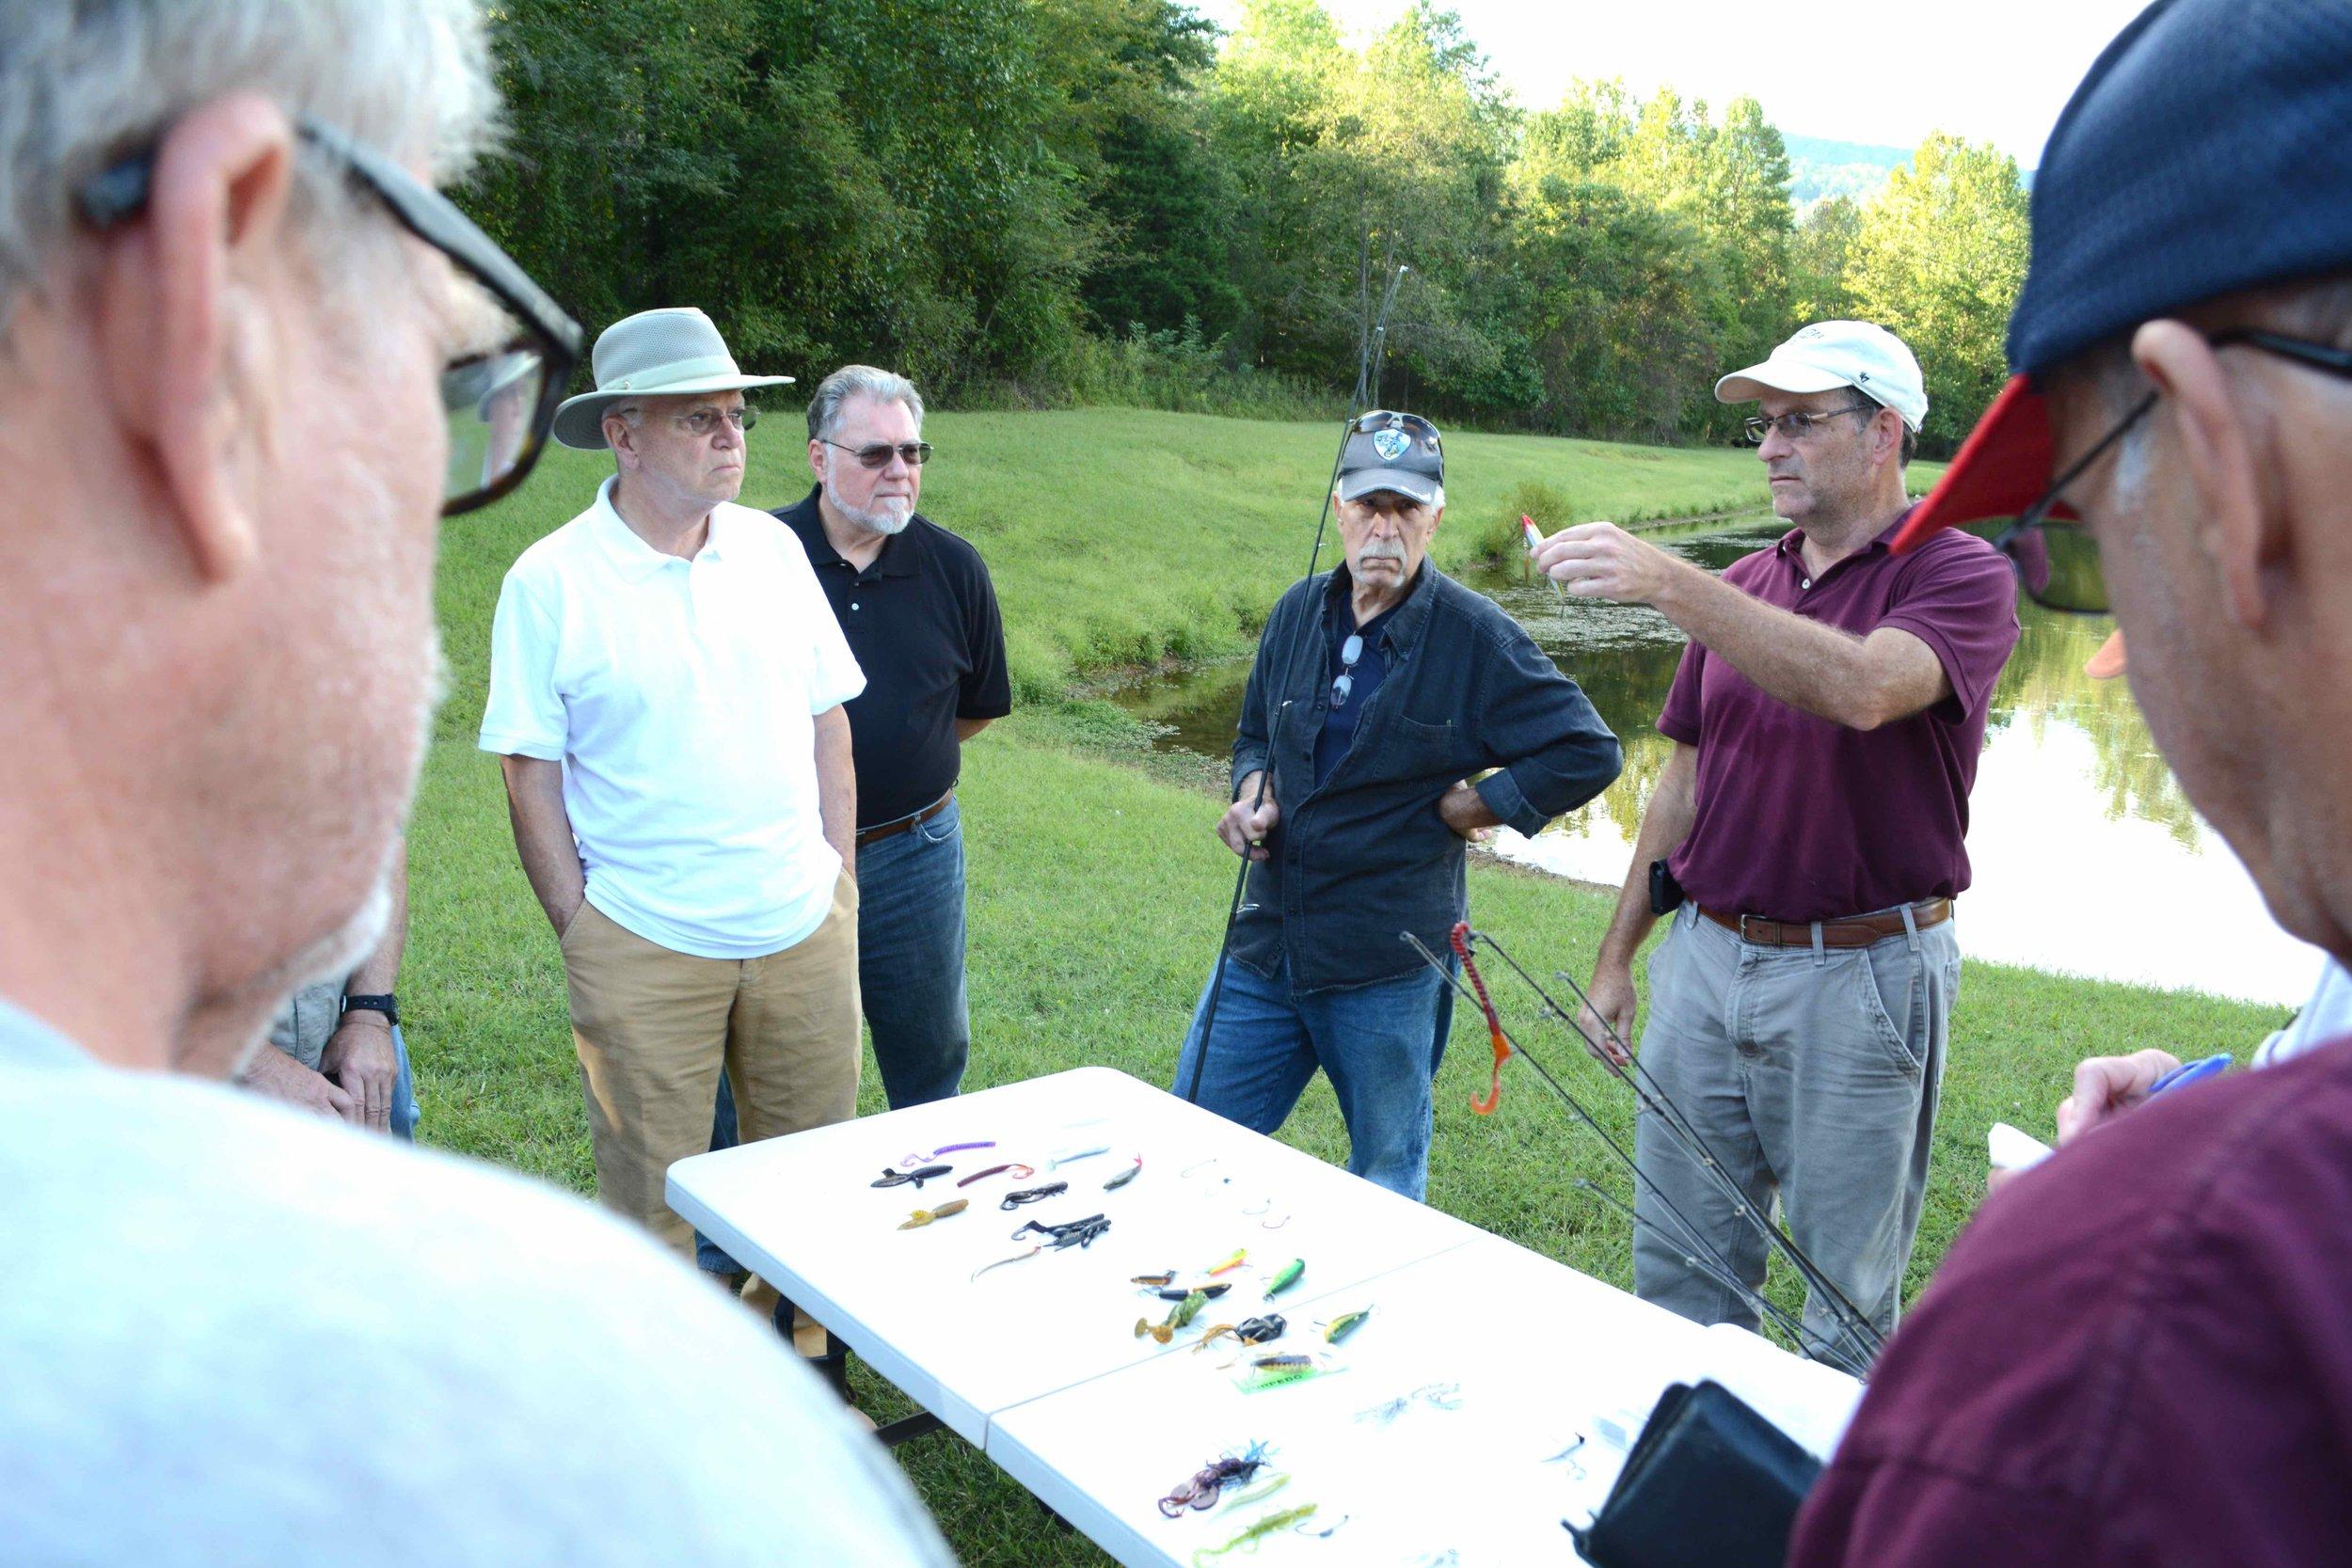 holeman bass fishing clinic WSC copy.jpg